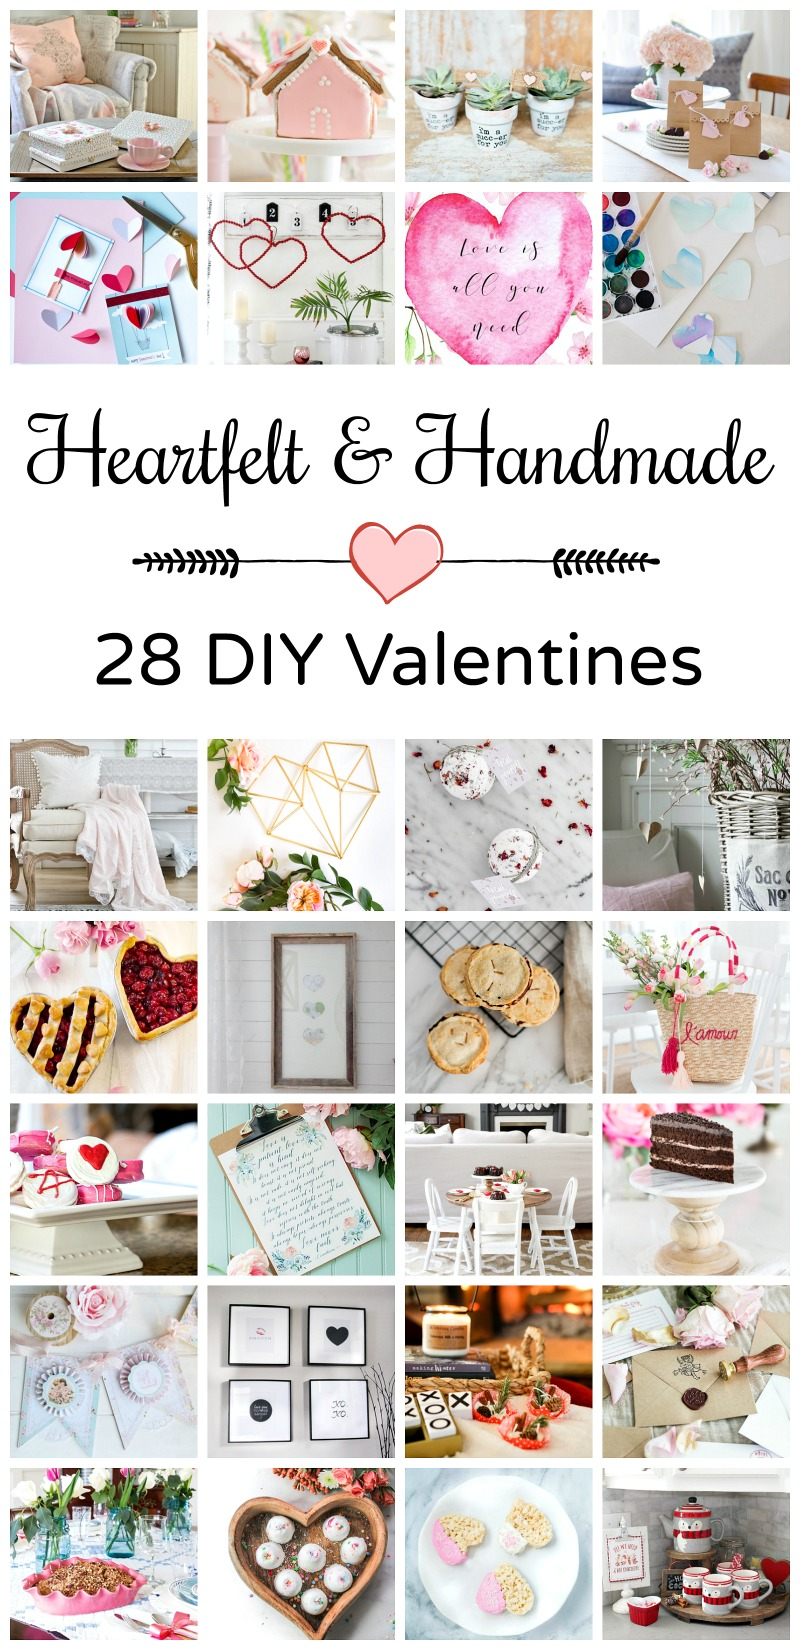 Heartfelt and Handmade - 28 DIY Valentines